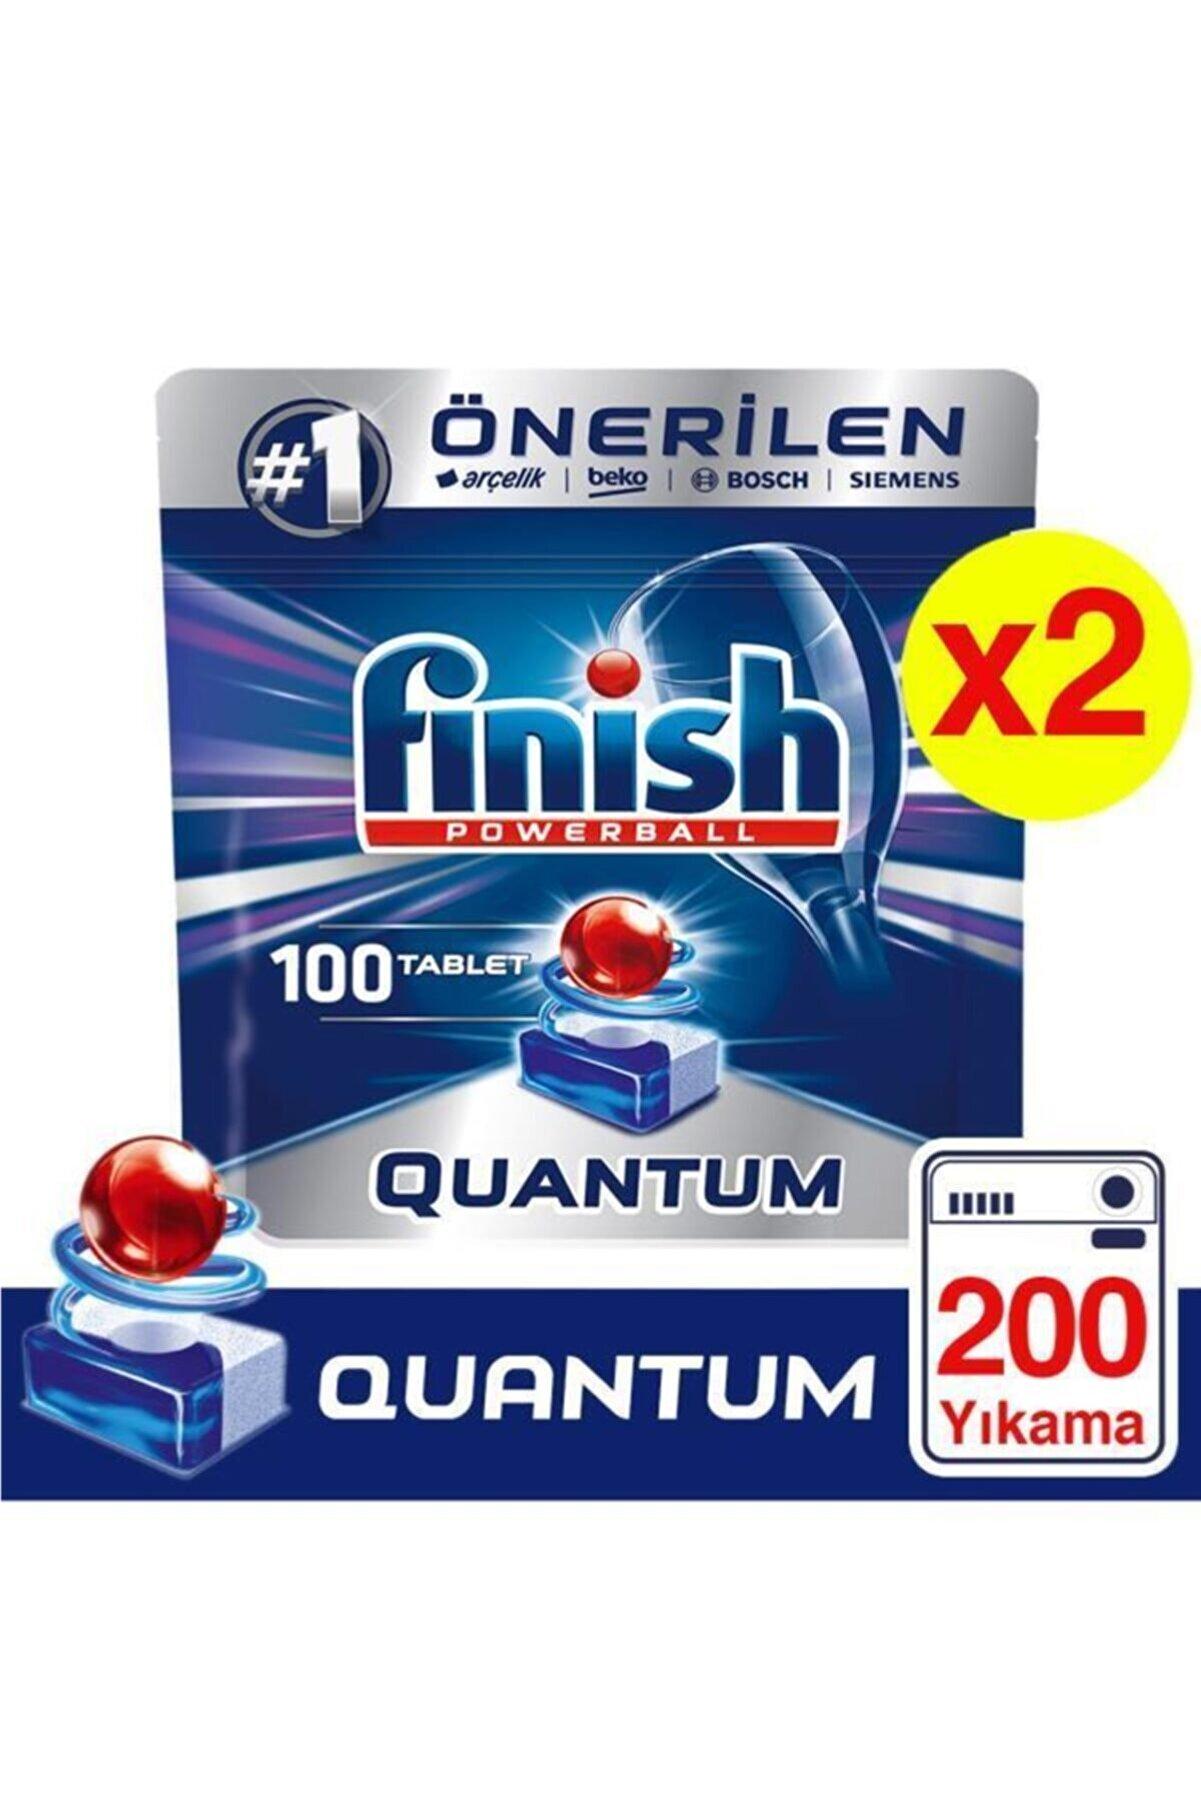 Finish Quantum 200 Tablet Bulaşık Makinesi Deterjanı (100x2) PKTFNSHQ100X2